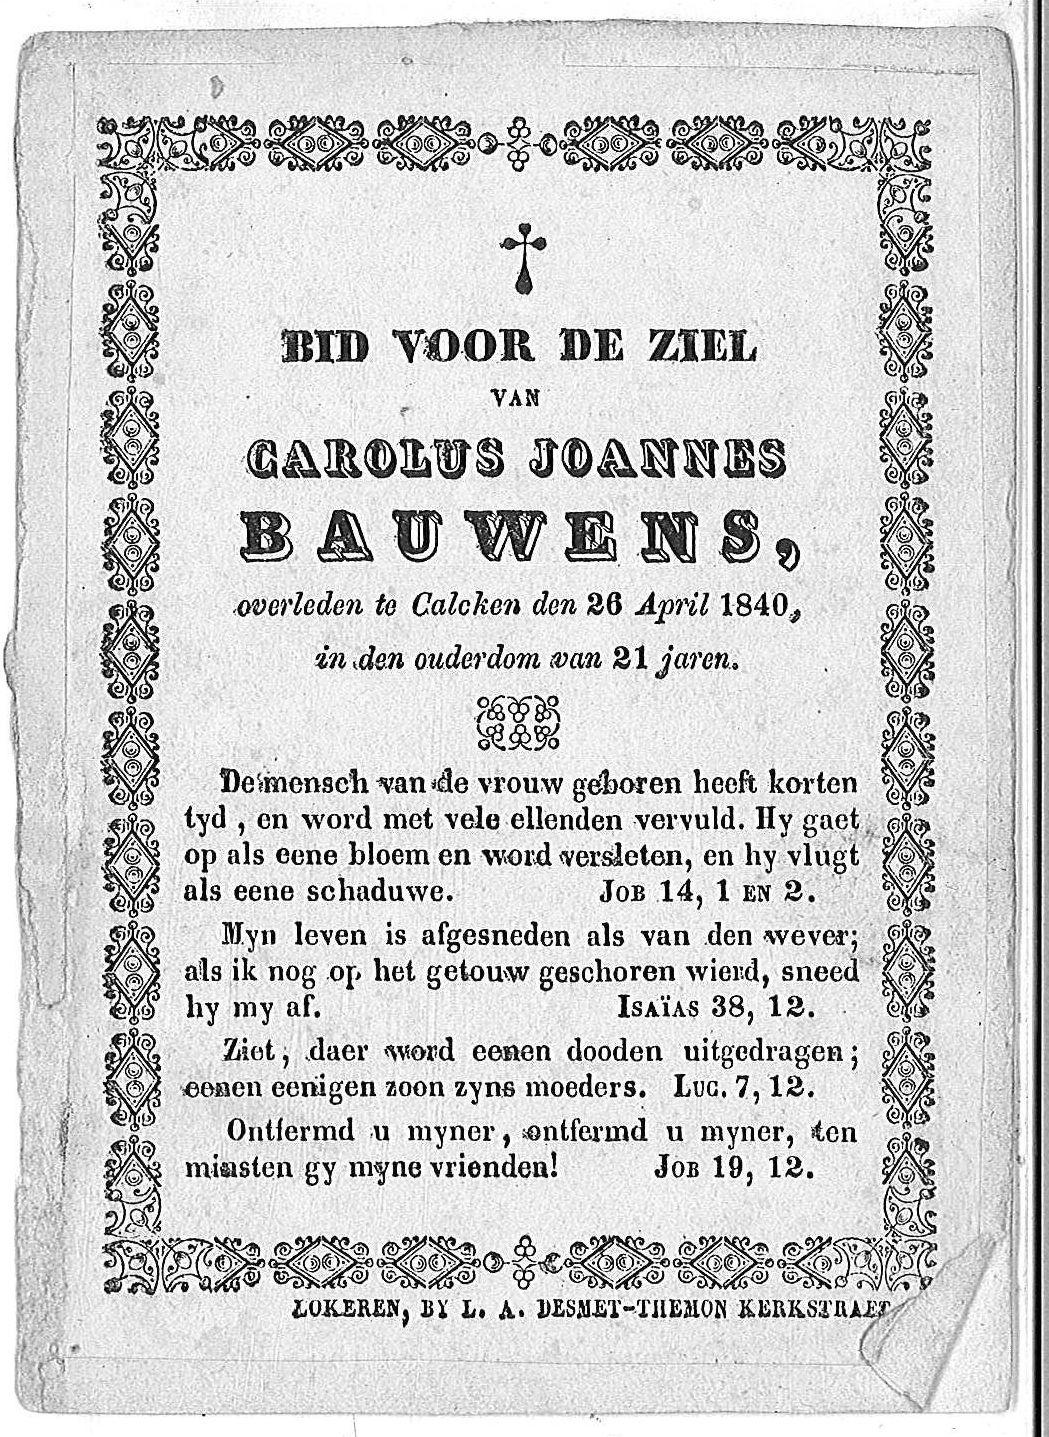 Carolus Joannes Bauwens